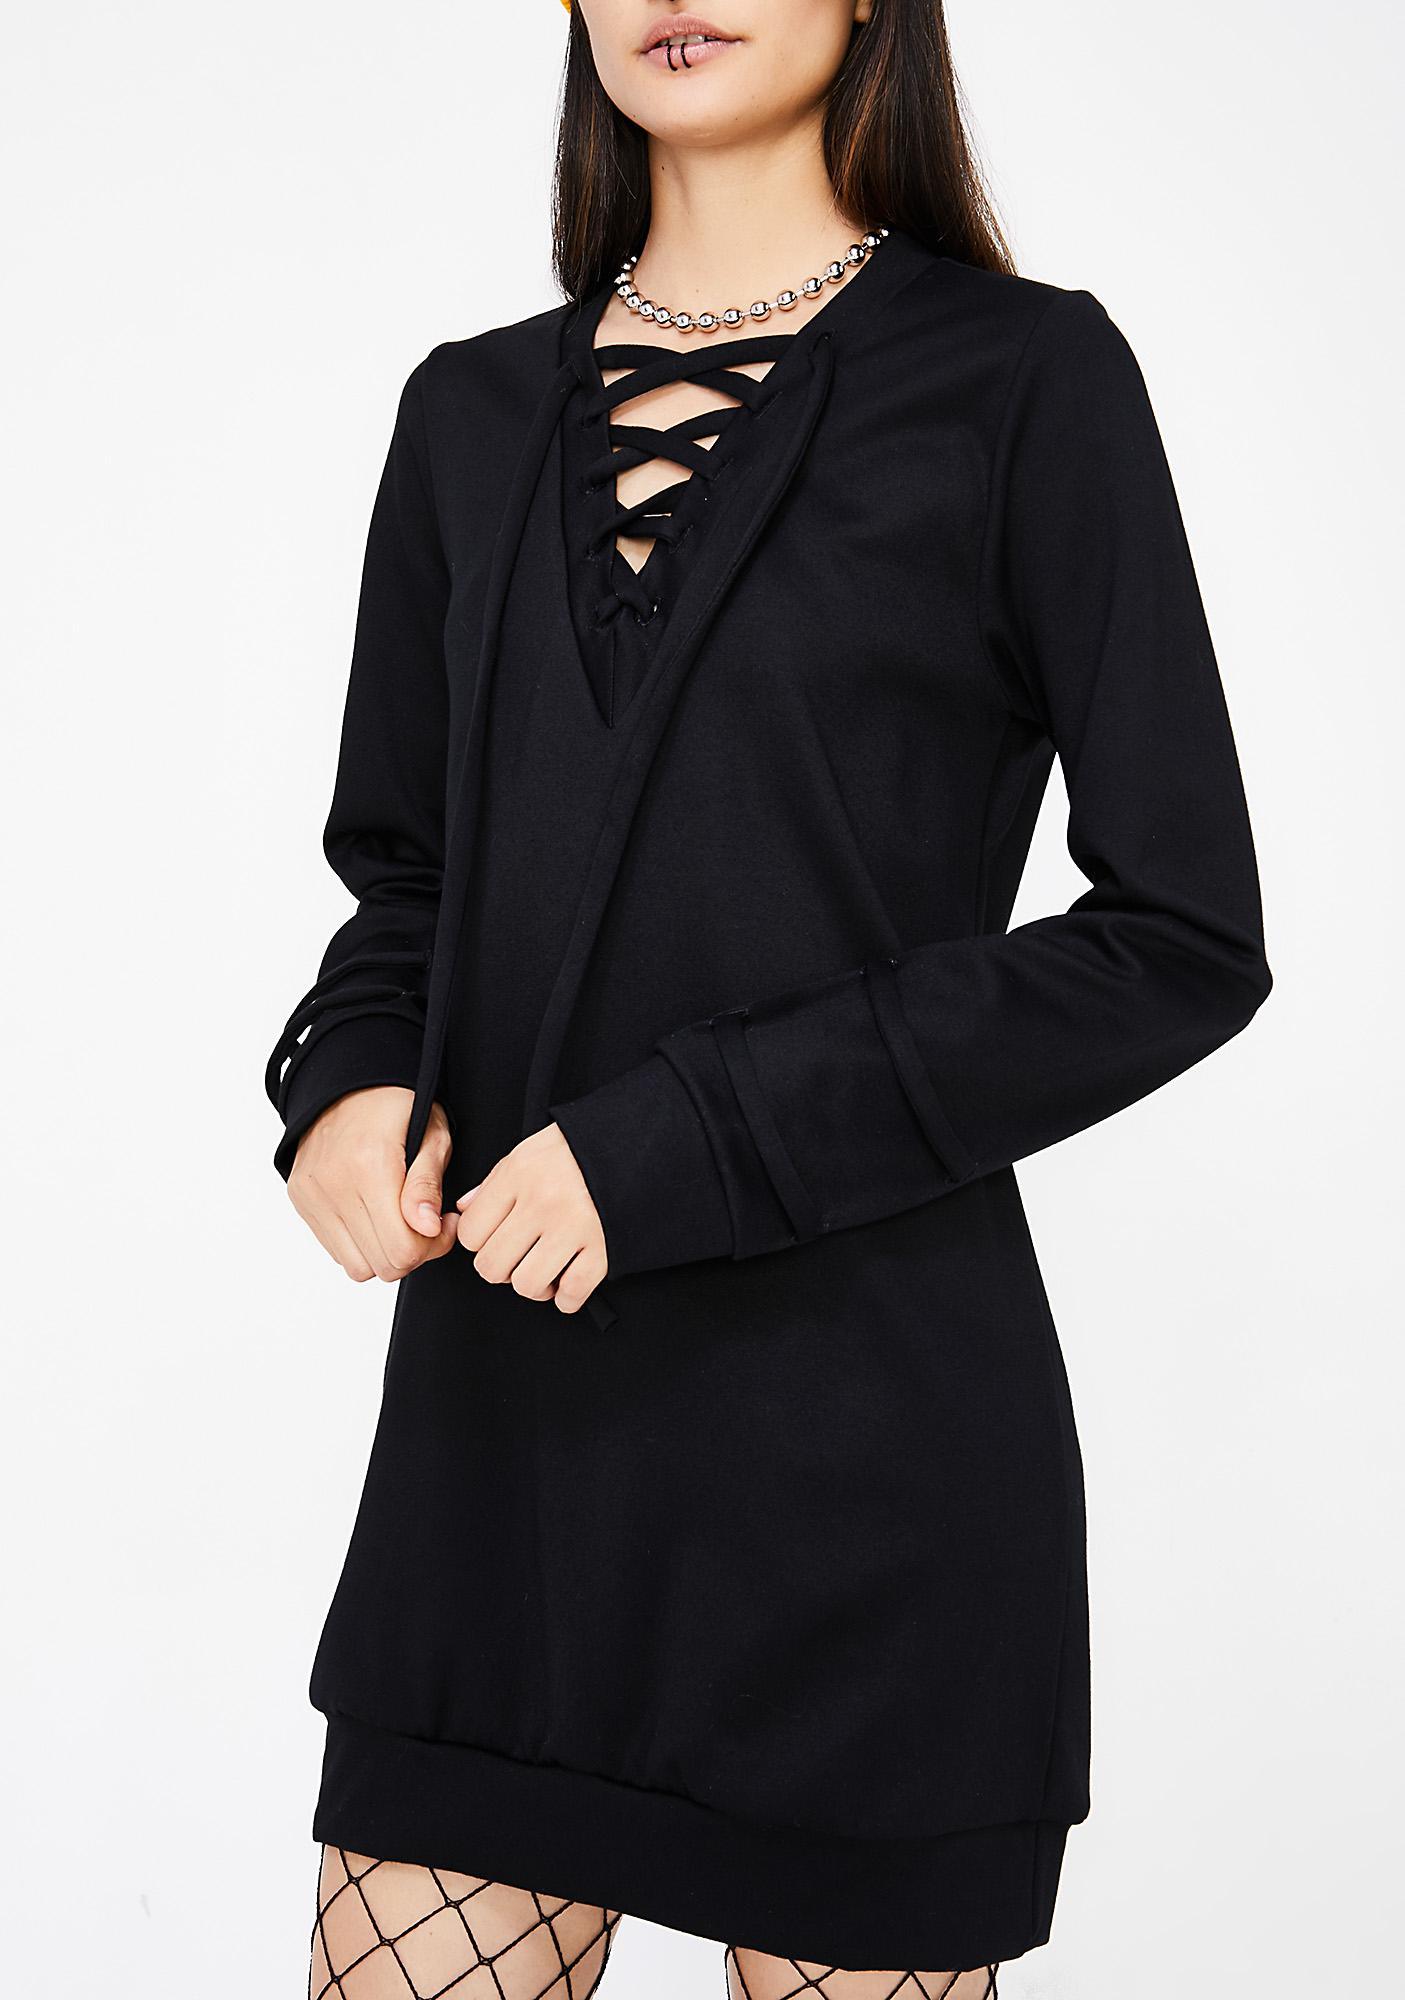 Bad Reputation Sweater Dress